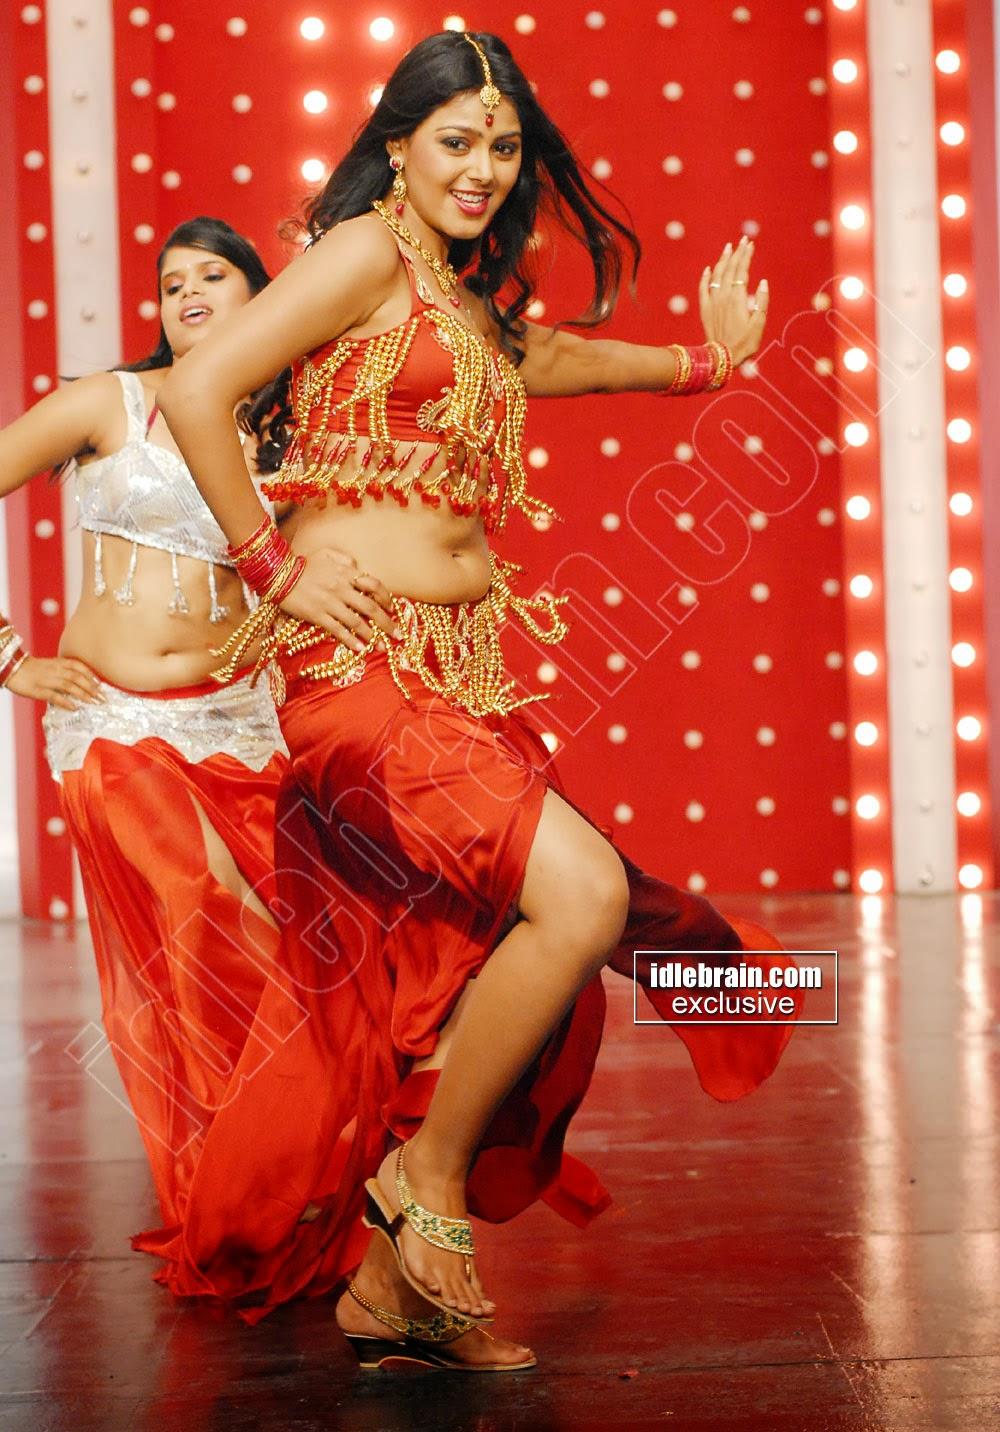 Indian Garam Masala: Monal gujar hot item dance showing ...